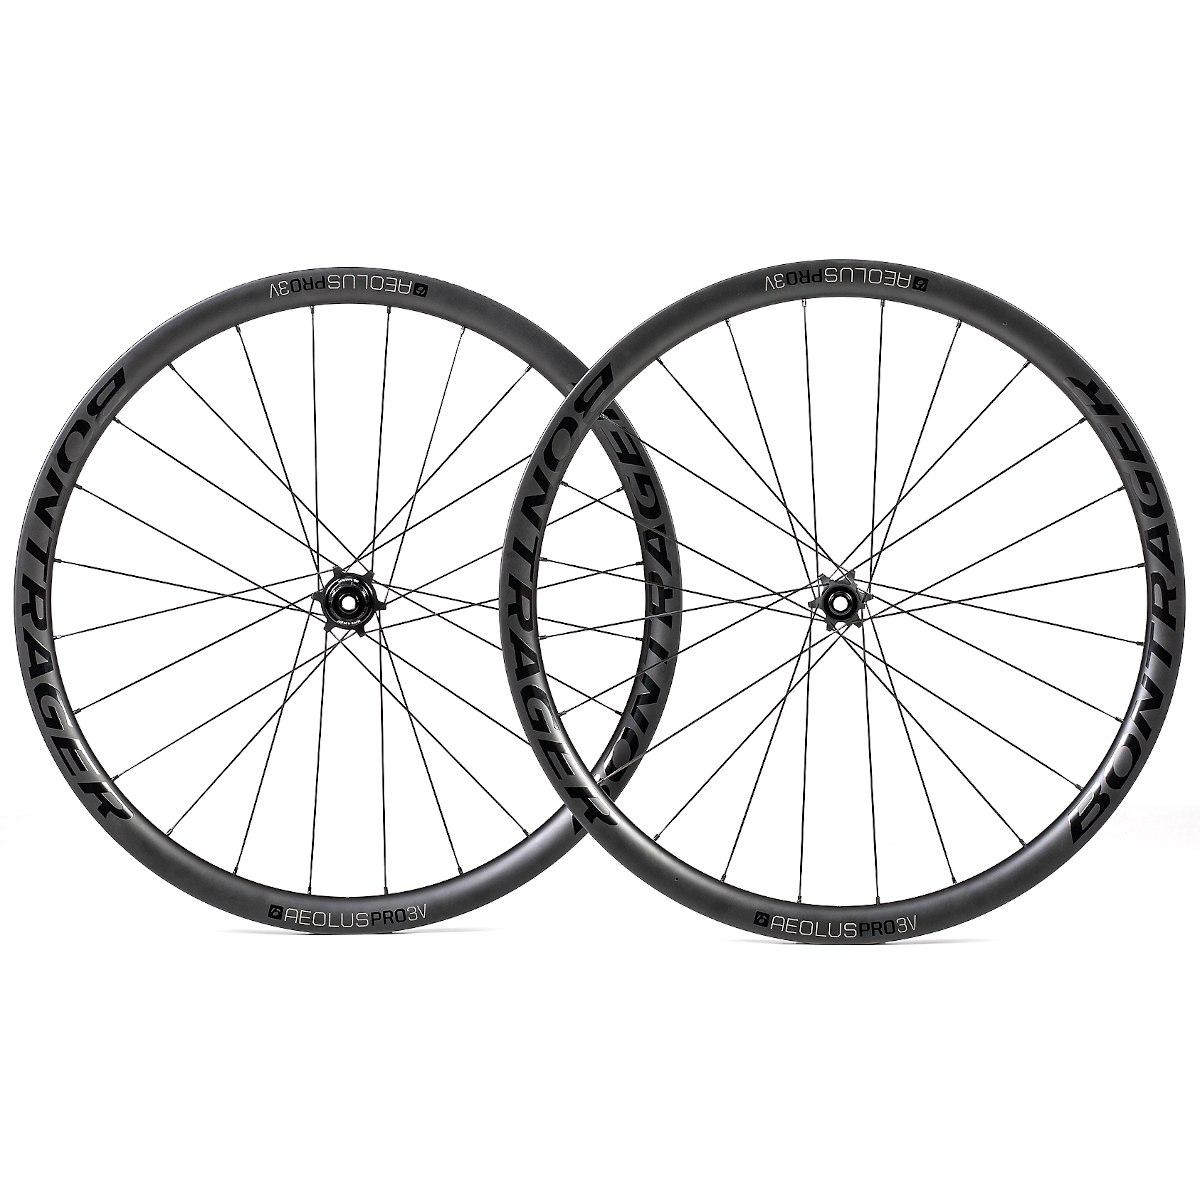 Bontrager Aeolus Pro 3V TLR Disc Road Wheelset - Clincher - Centerlock - FW: 12x100mm   RW: 12x142mm